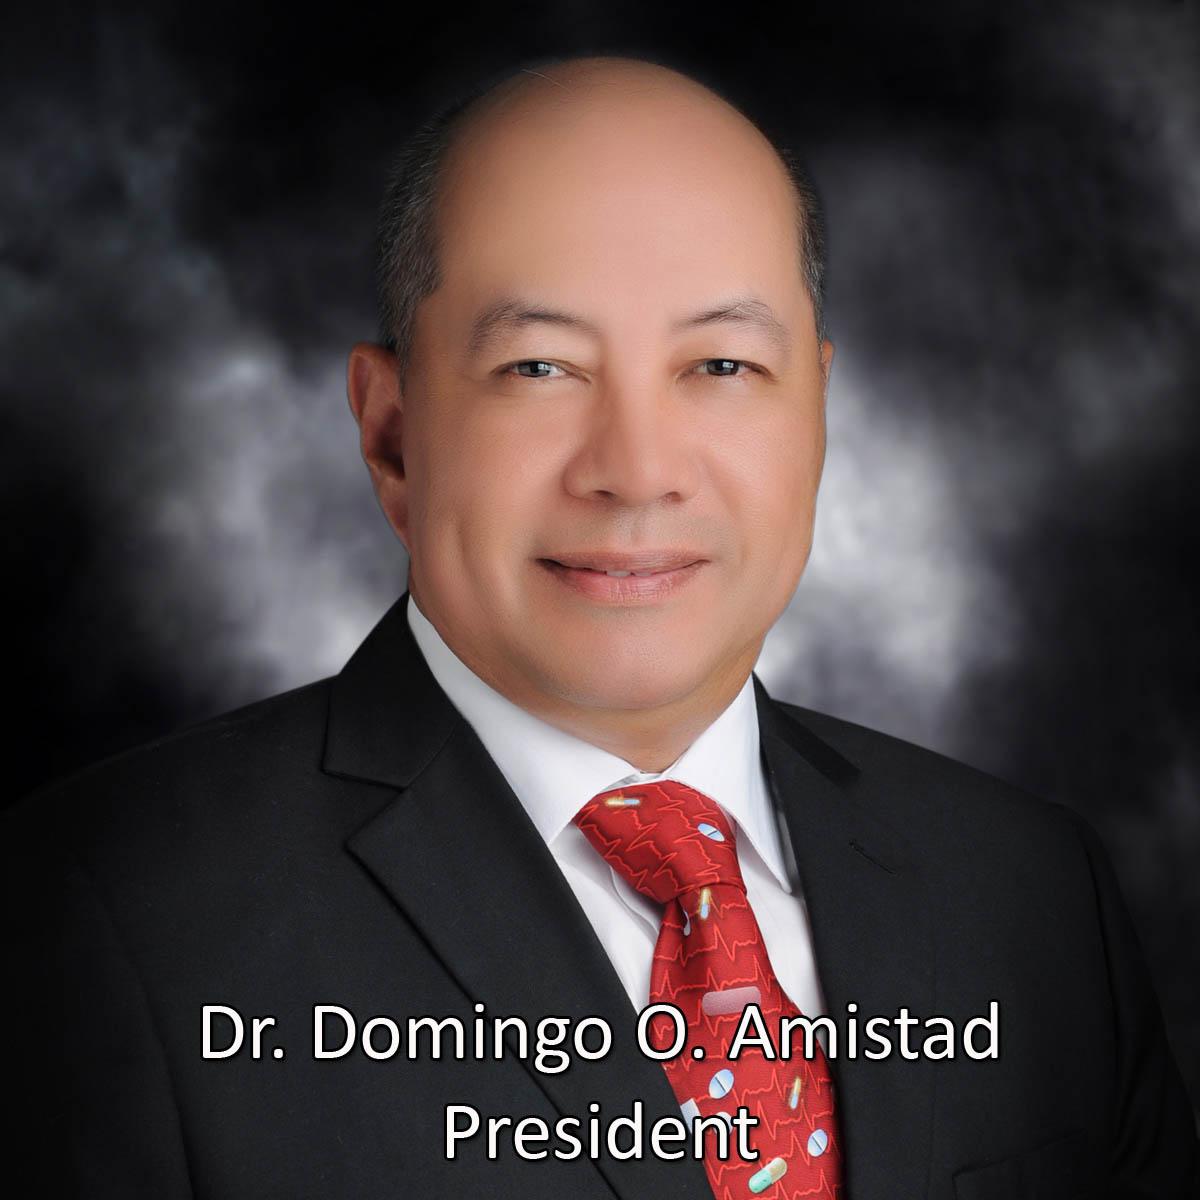 002DrDomingoAmistad_President